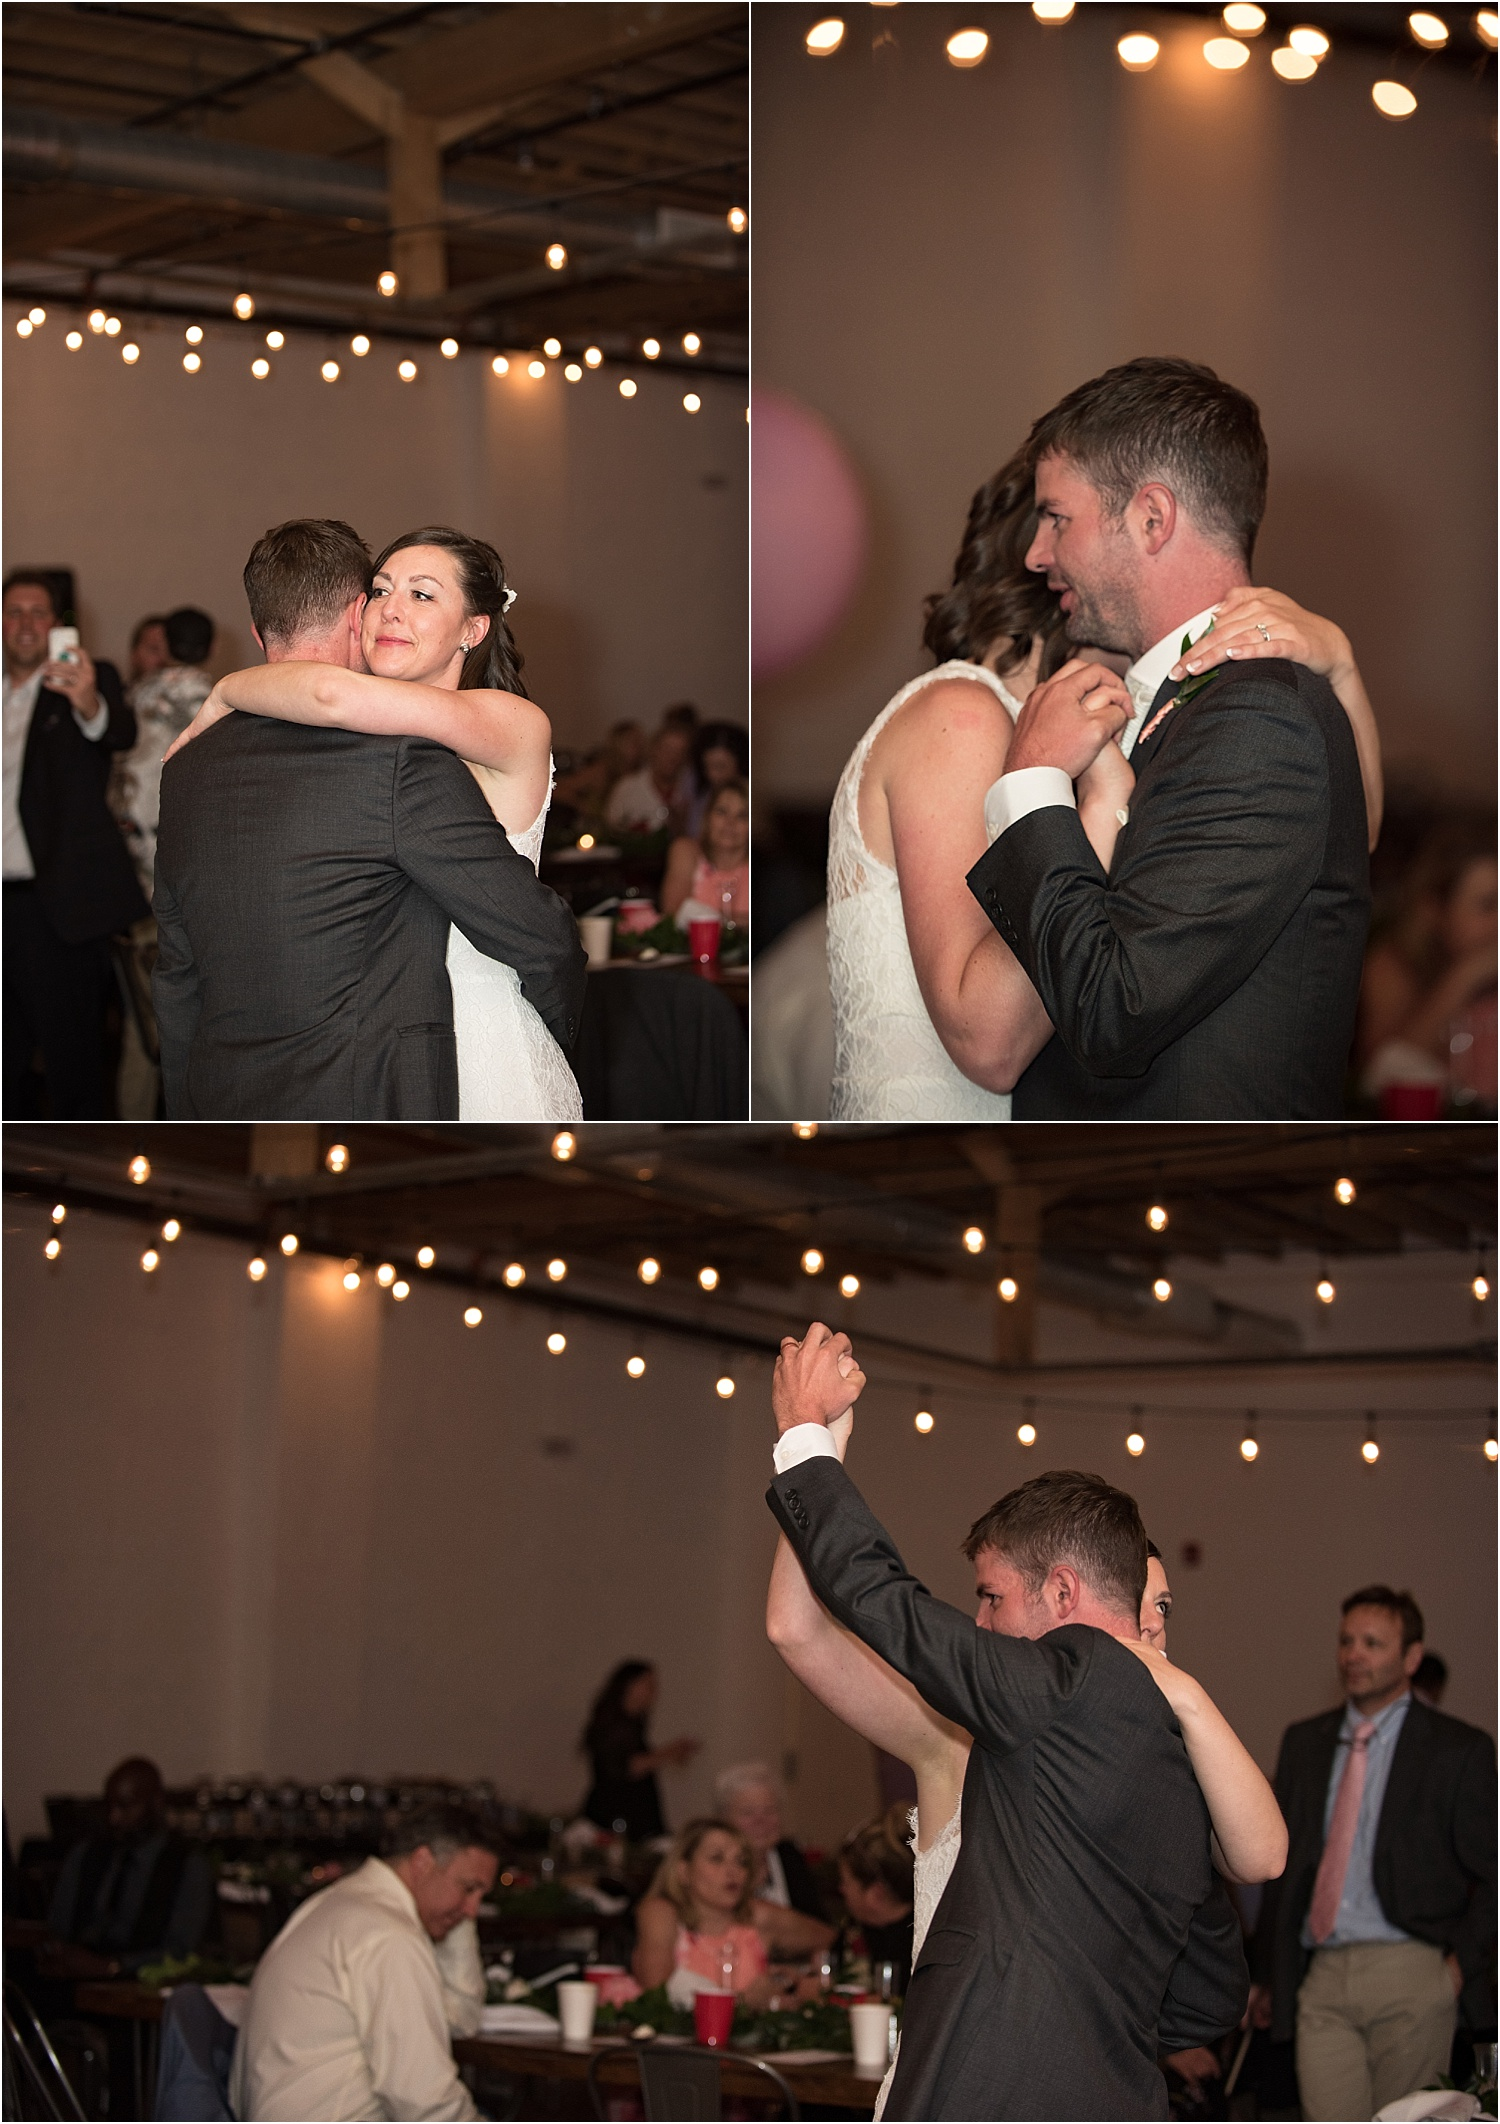 Denver_Wedding_Photography_Skylight_Urban_Venue_Modern_Bride_051.jpg